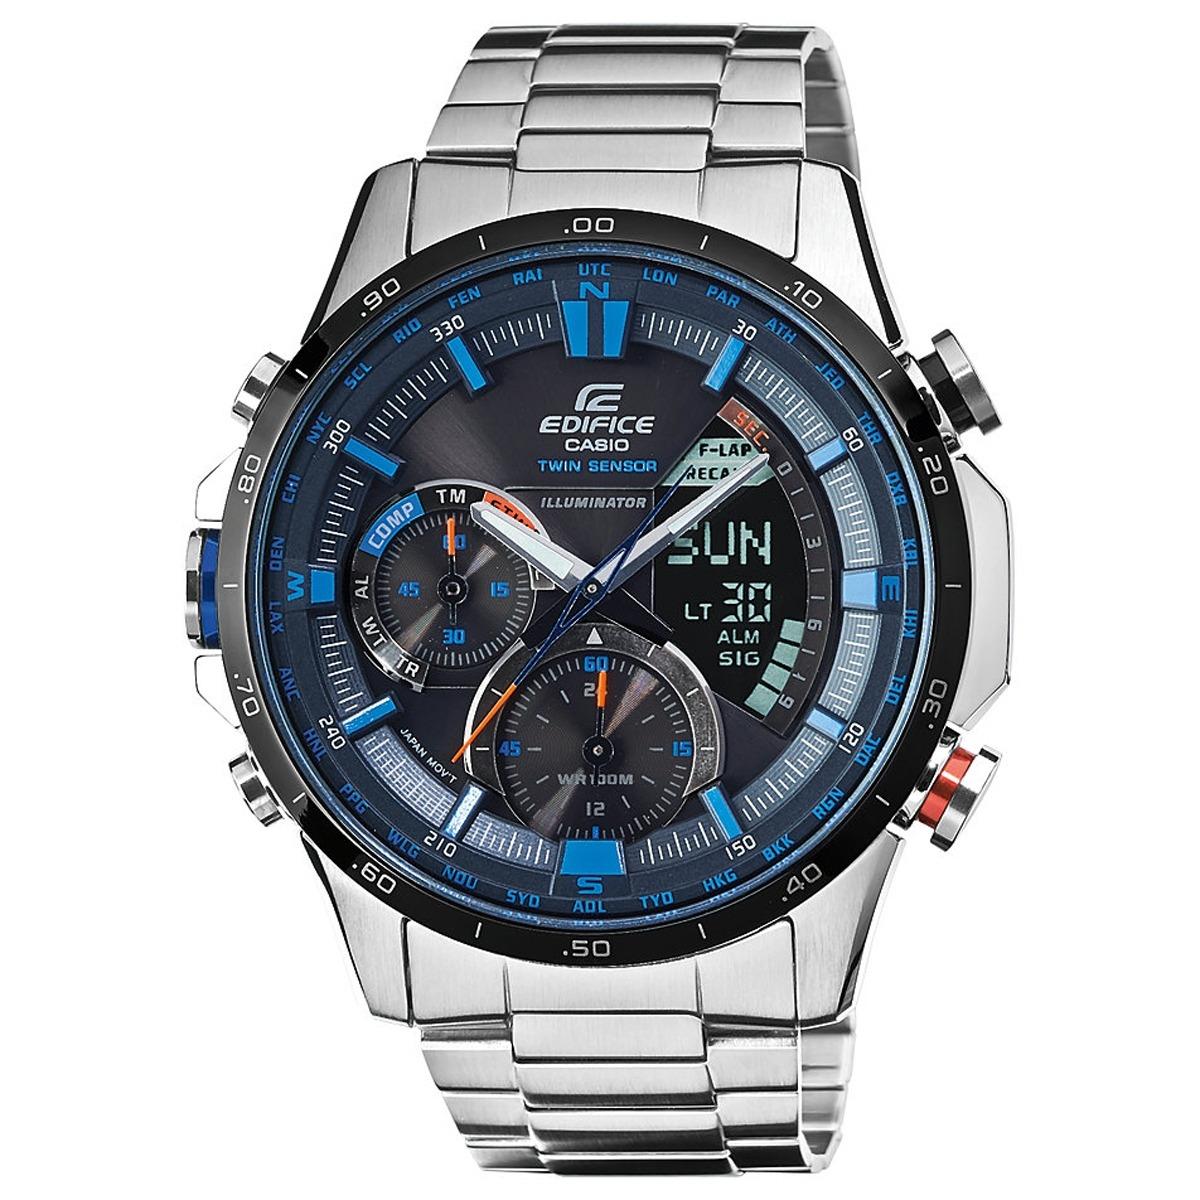 840365aeda2a relógio casio edifice twin sensor cronógrafo anadigi masculi. Carregando  zoom.